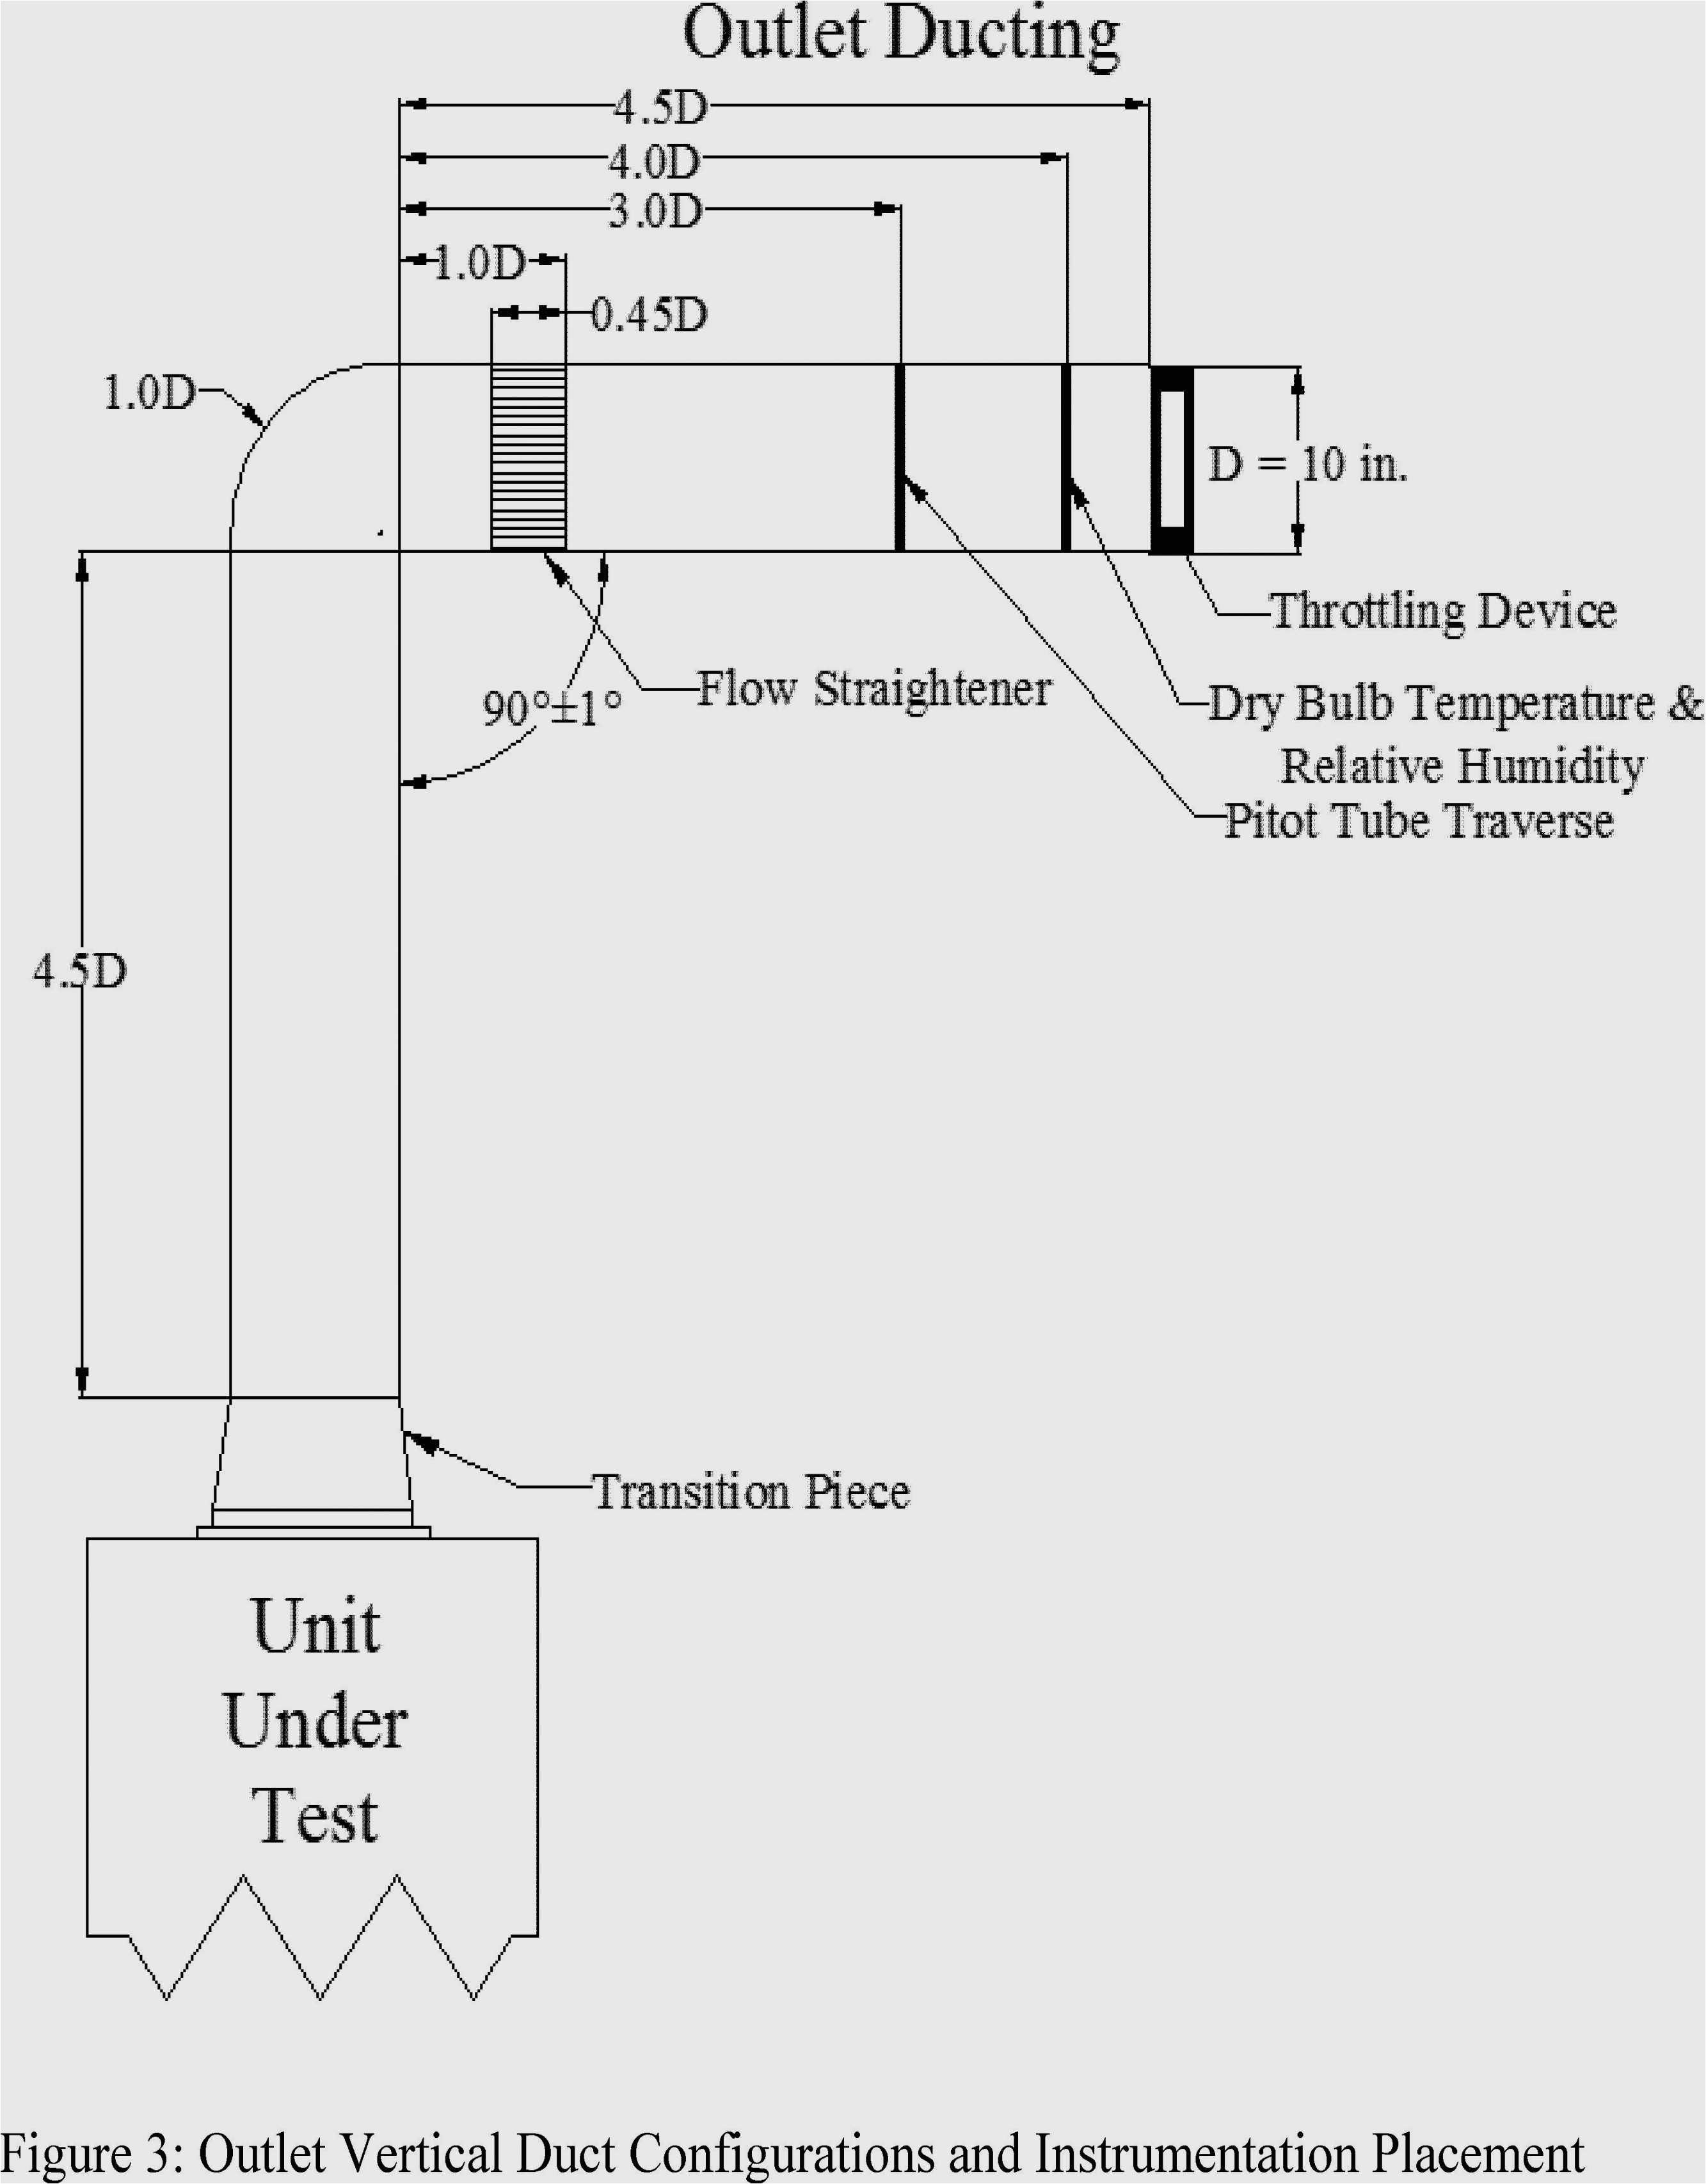 logic diagram shapes wiring diagram centrewire diagram shapes visio electrical shapes wiring diagrams logicvisio electrical shapes